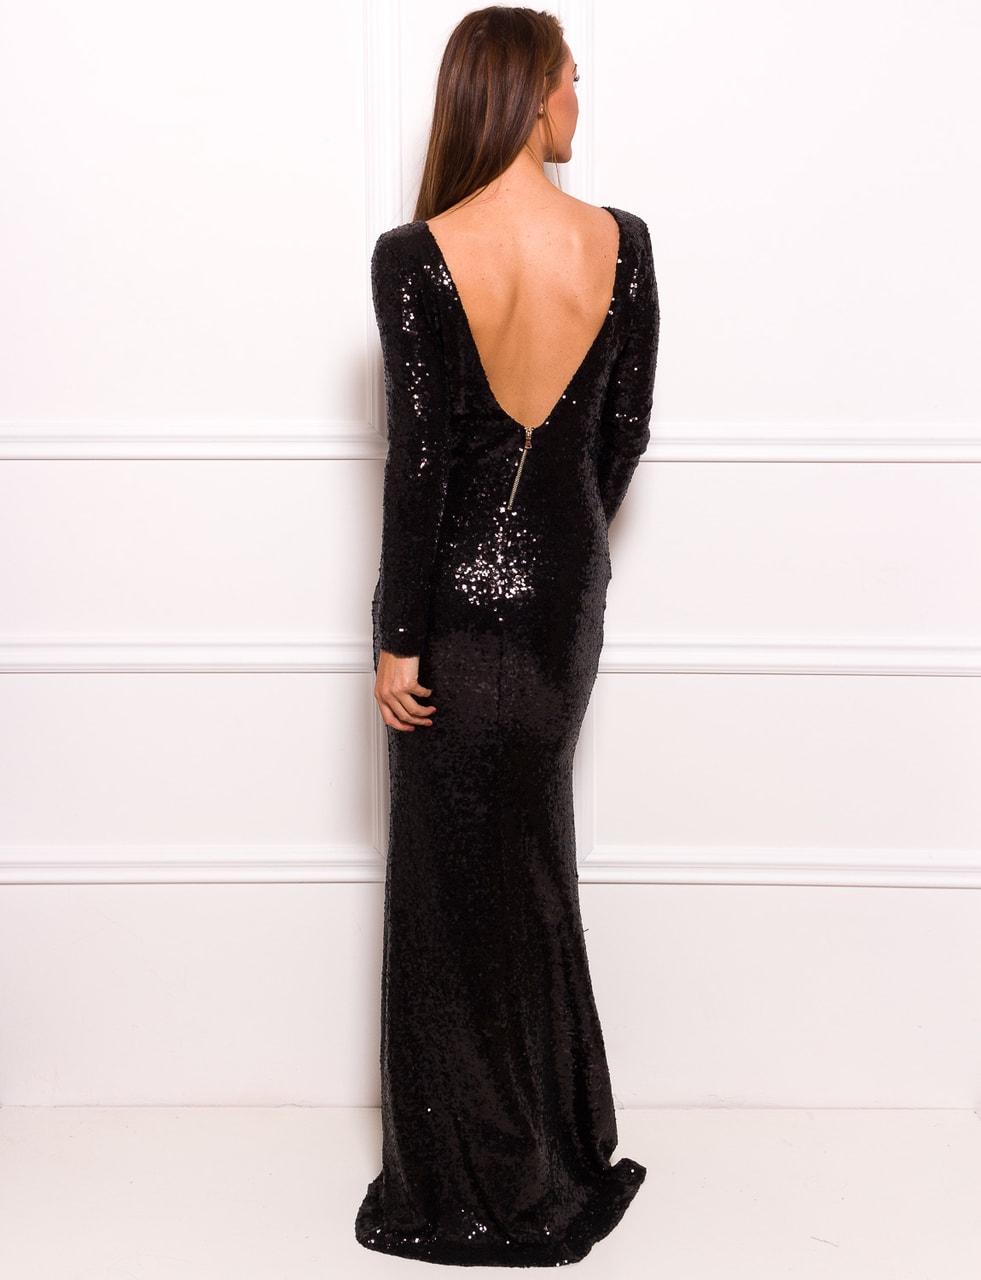 Glamadise.sk - Spoločenské luxusné dlhé šaty s flitrami a rukávmi ... 7dd717eb9a3